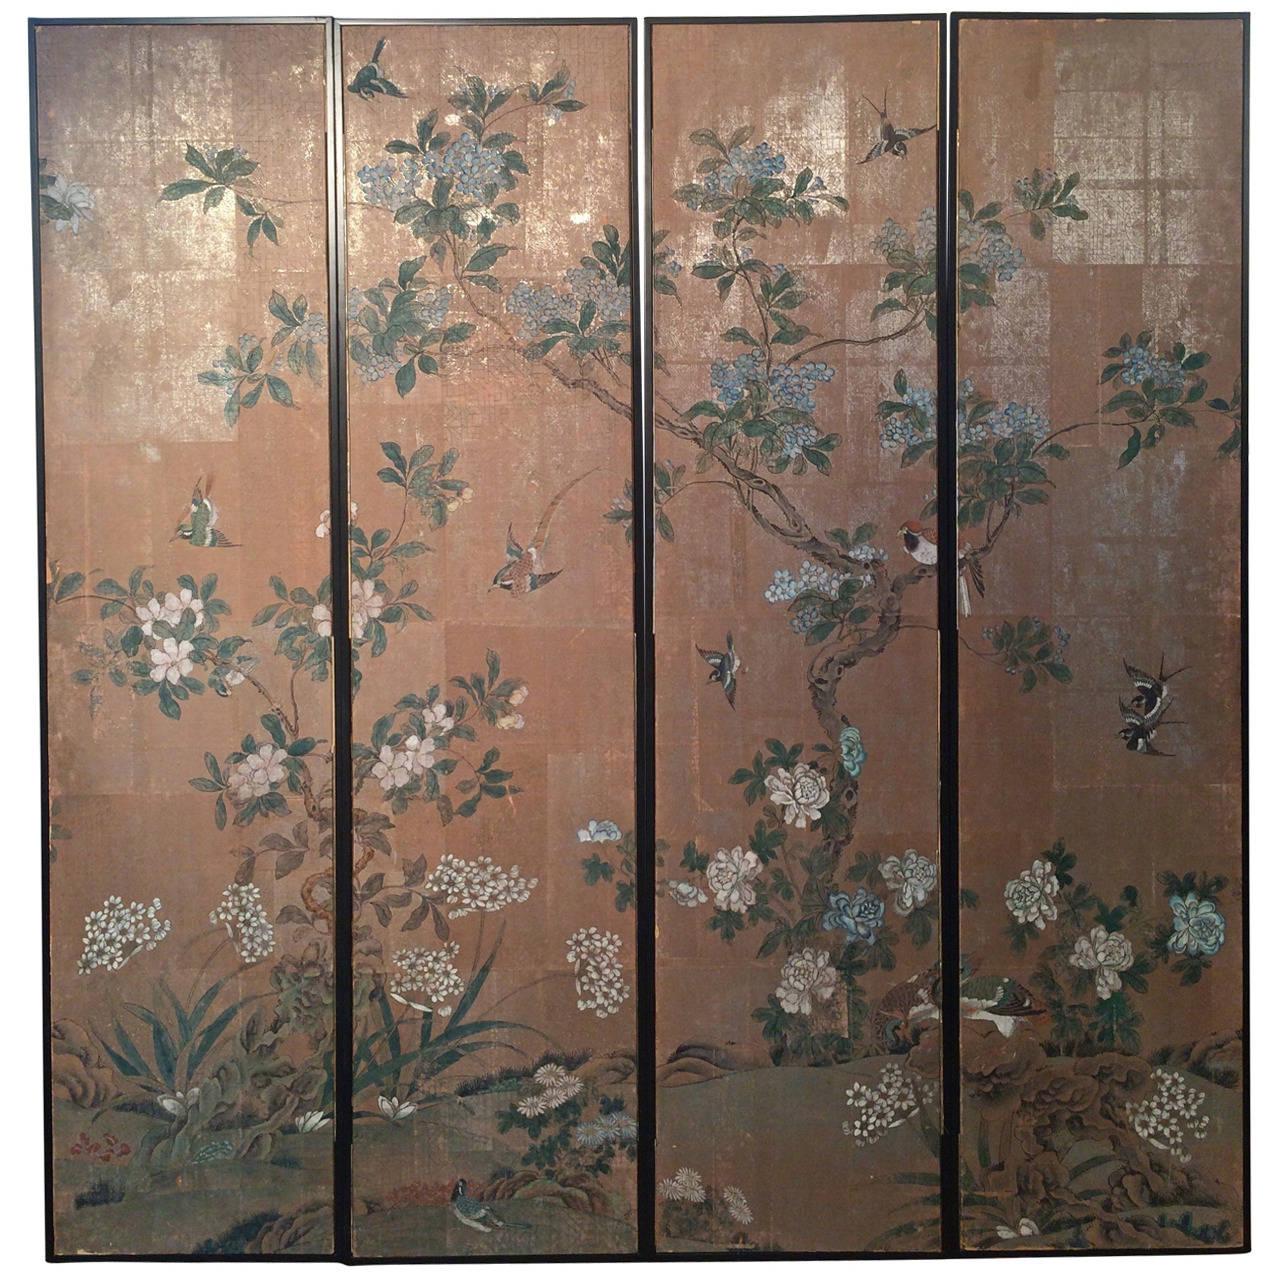 48 Chinoiserie Wallpaper Panels For Sale On Wallpapersafari